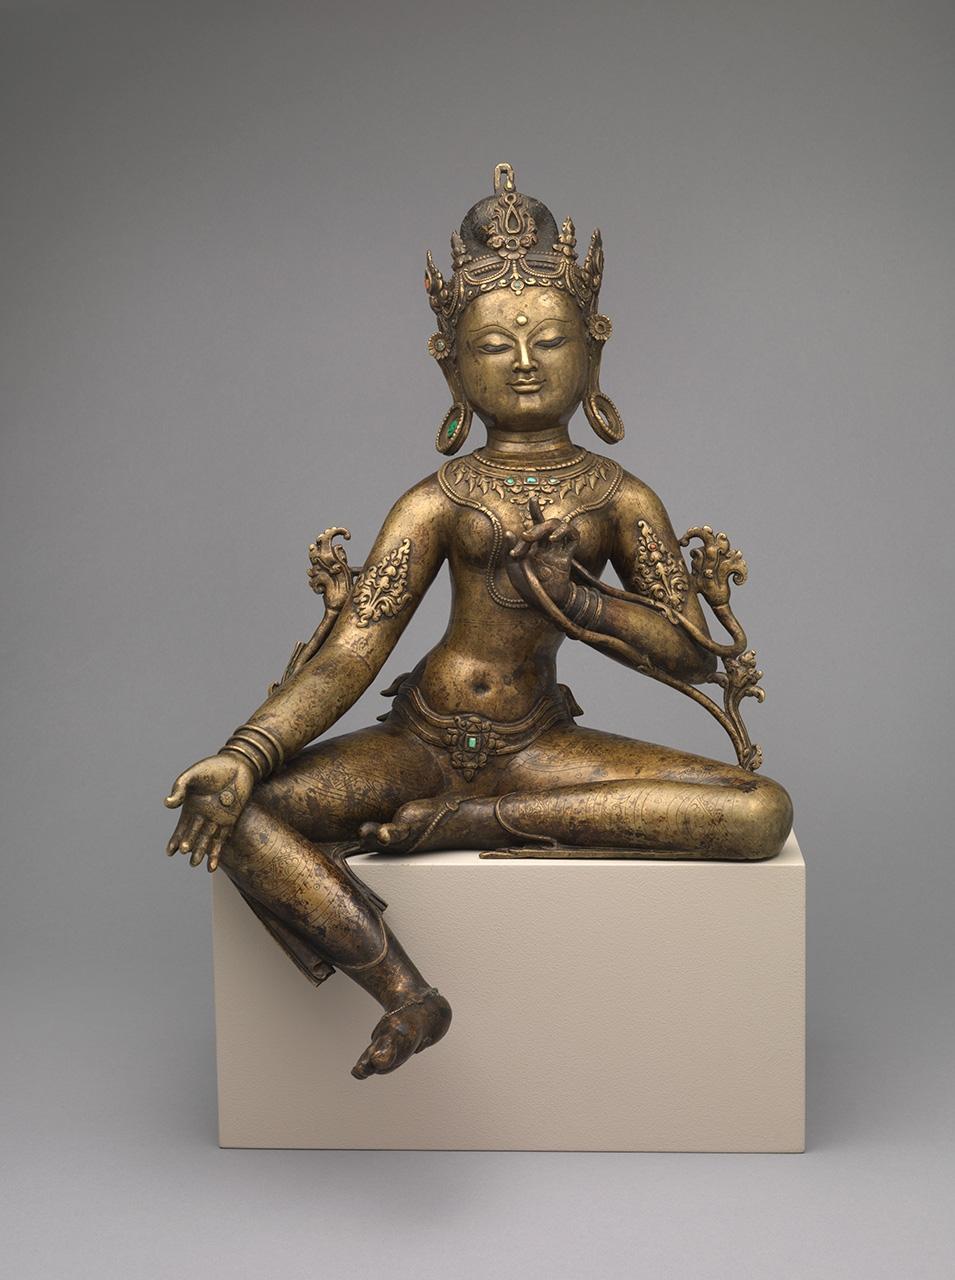 Green Tara, Enlightened Female, Protector and Savior